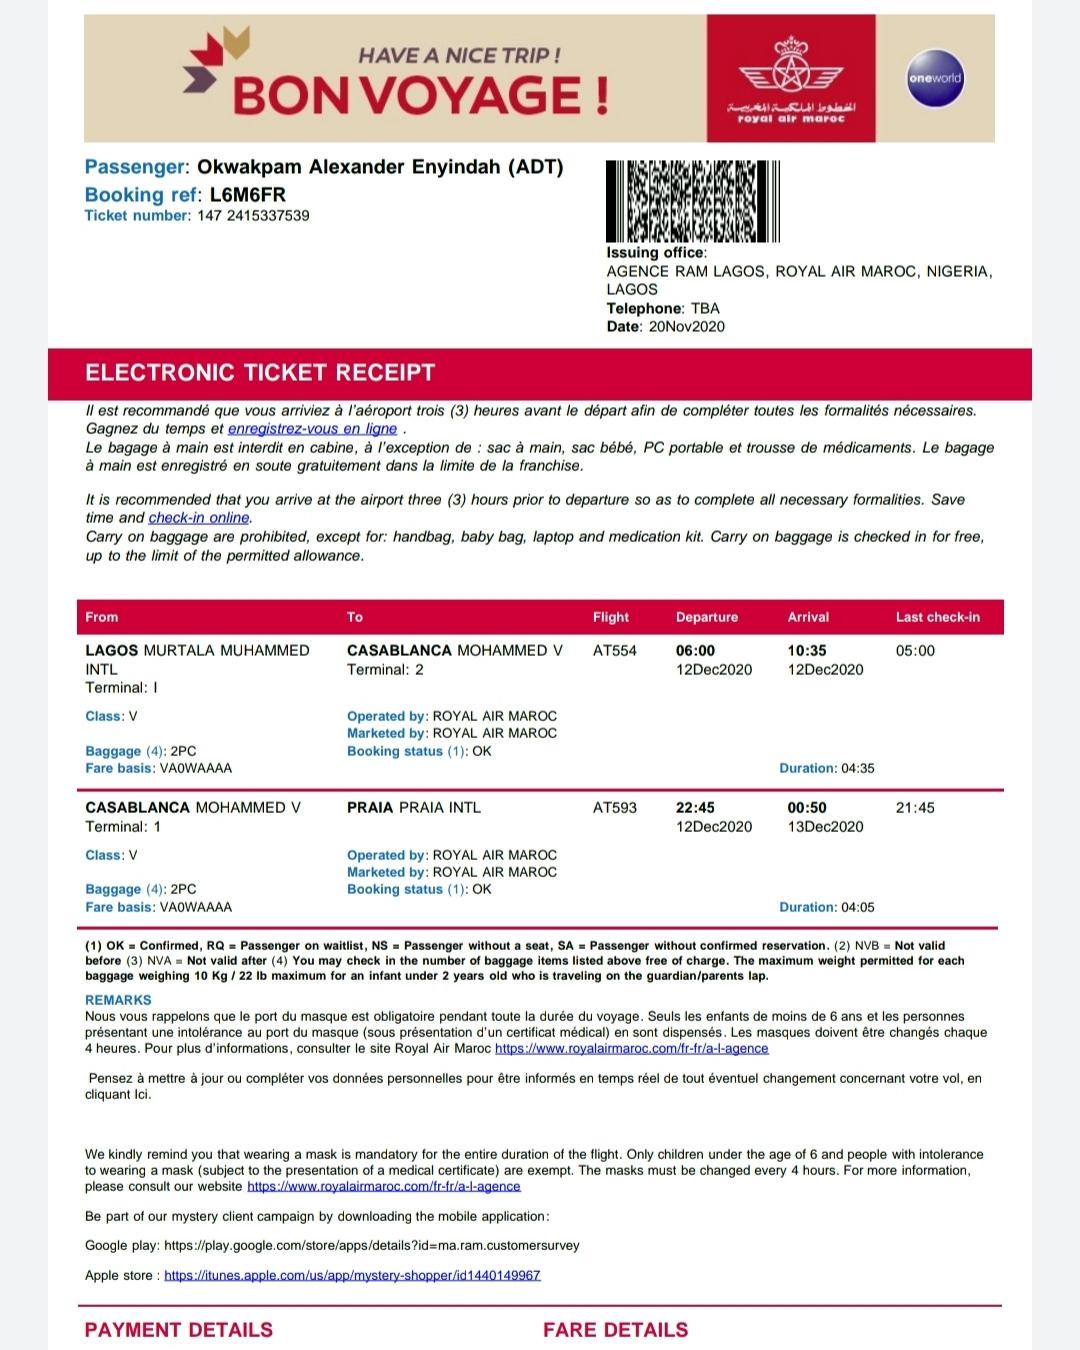 Flight ticket on board Royal Air Maroc